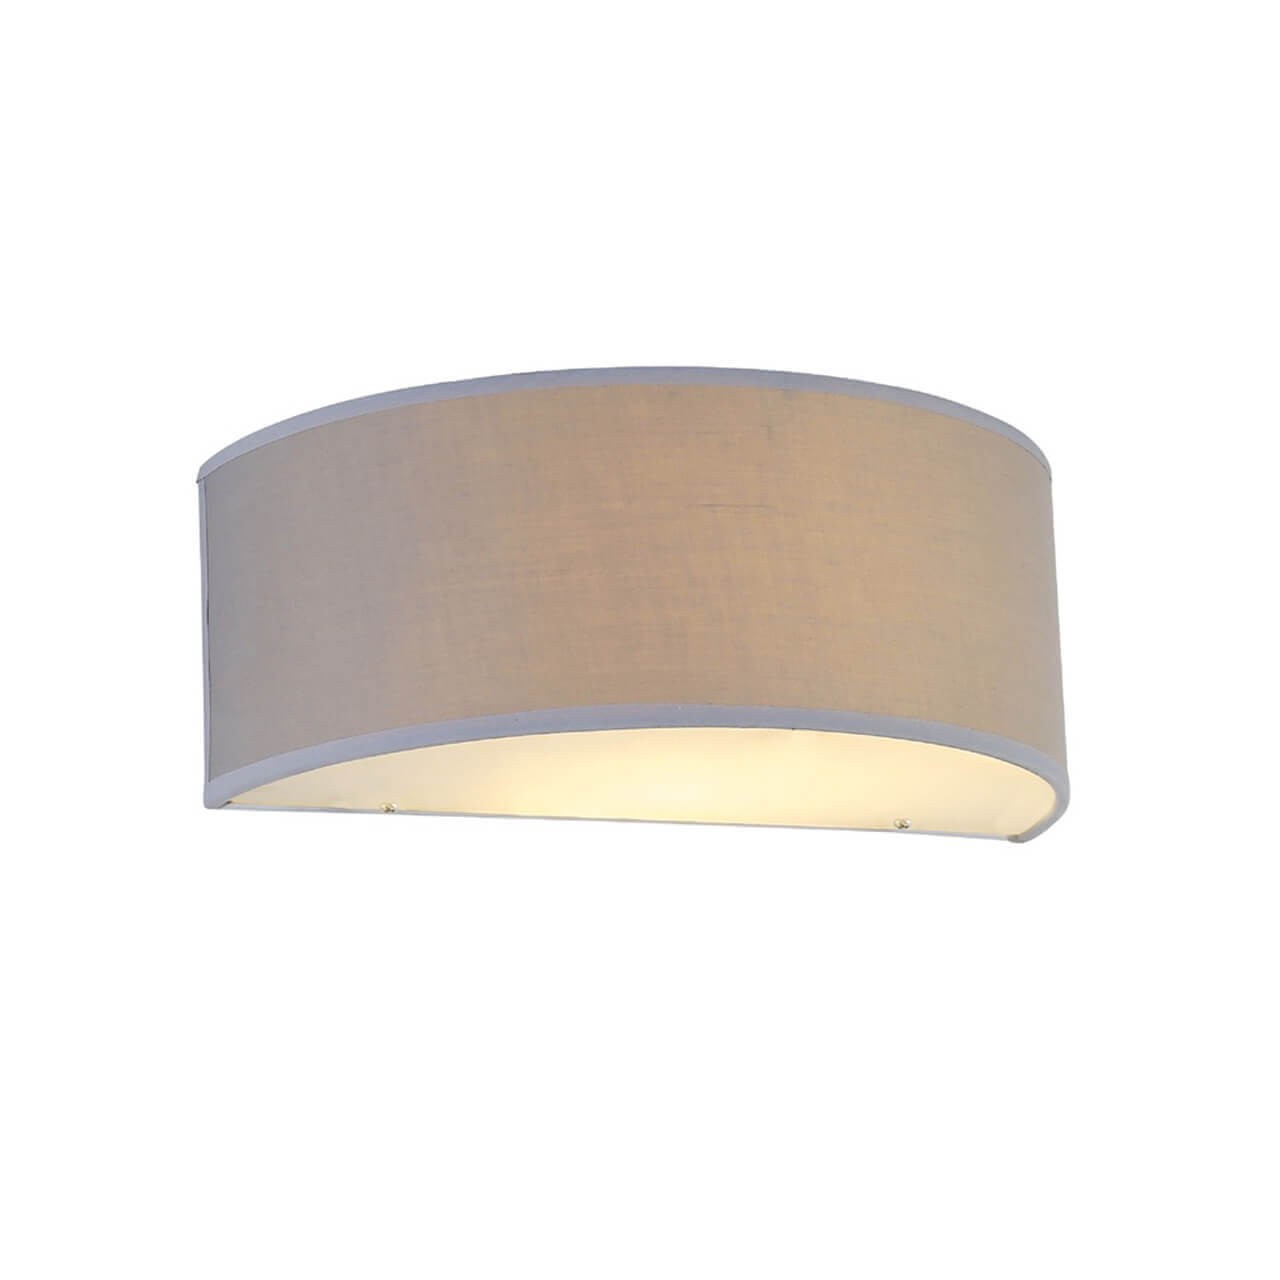 Светильник Crystal Lux Jewel AP1 Gray Jewel